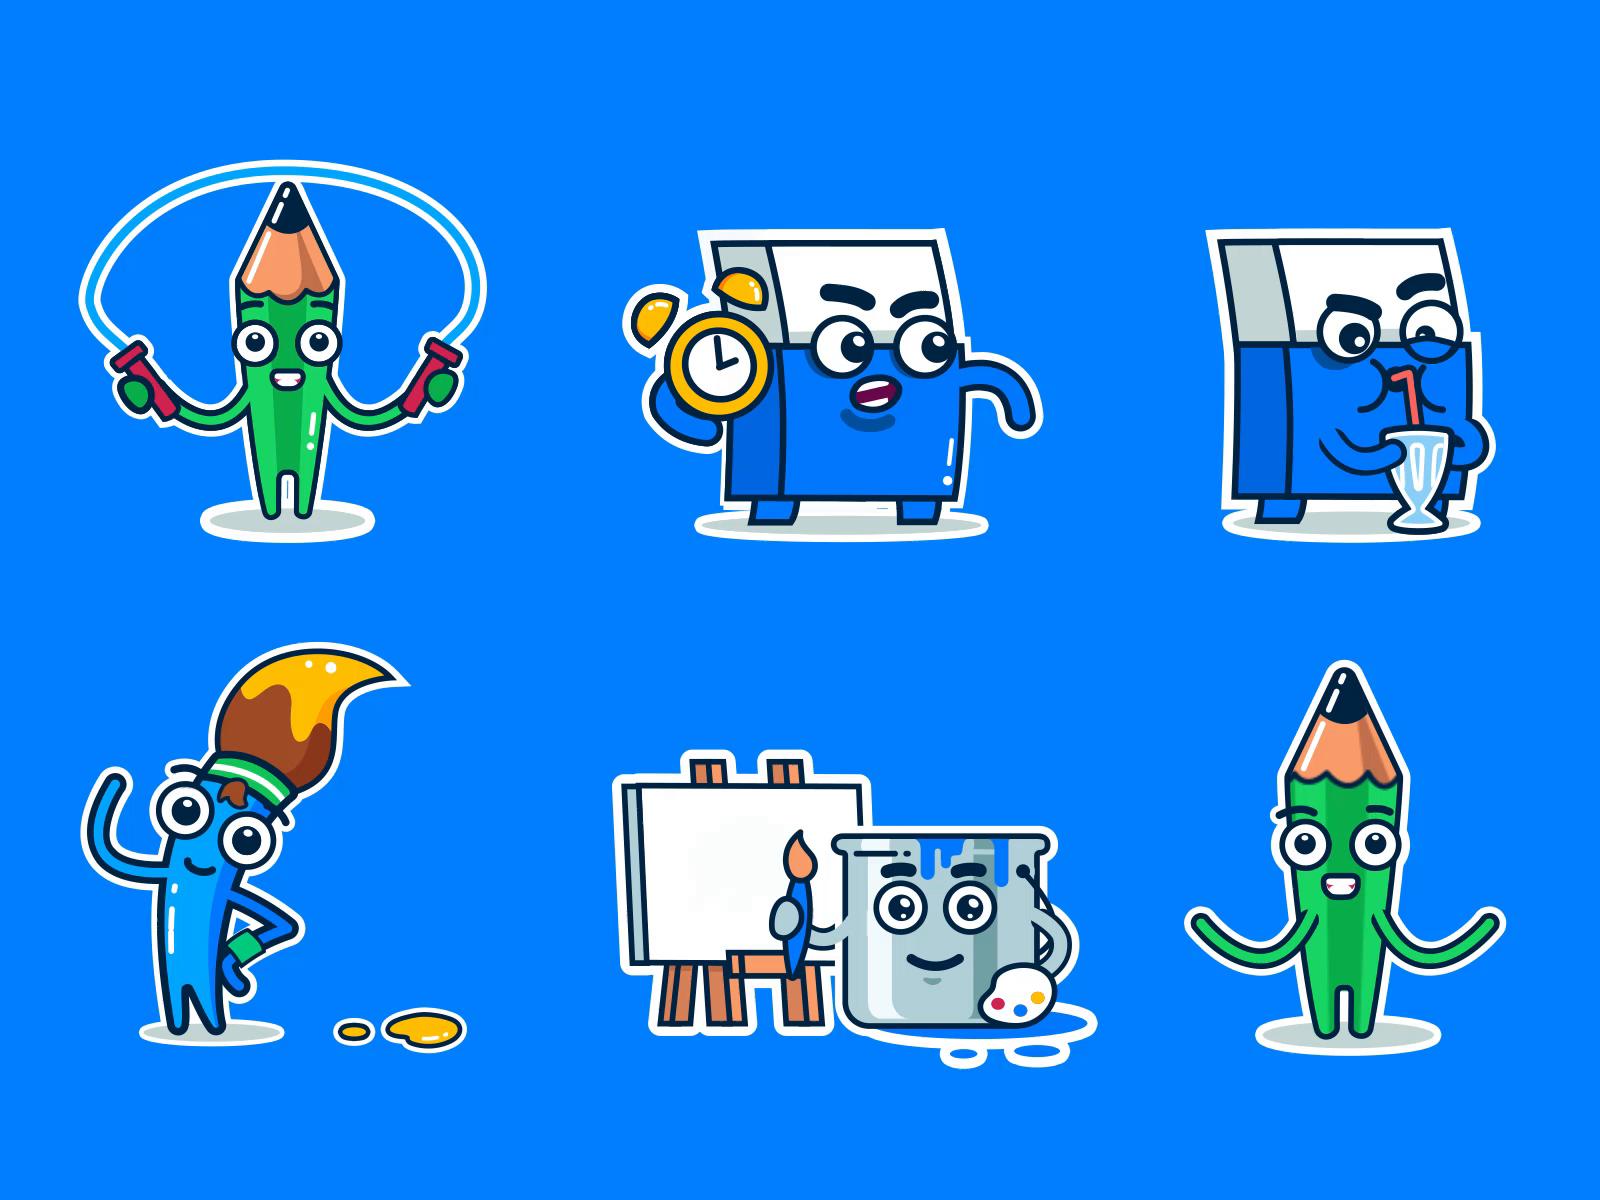 Gartic Io Stickers By Samir Taiar Stickers Sticker Design Game Interface